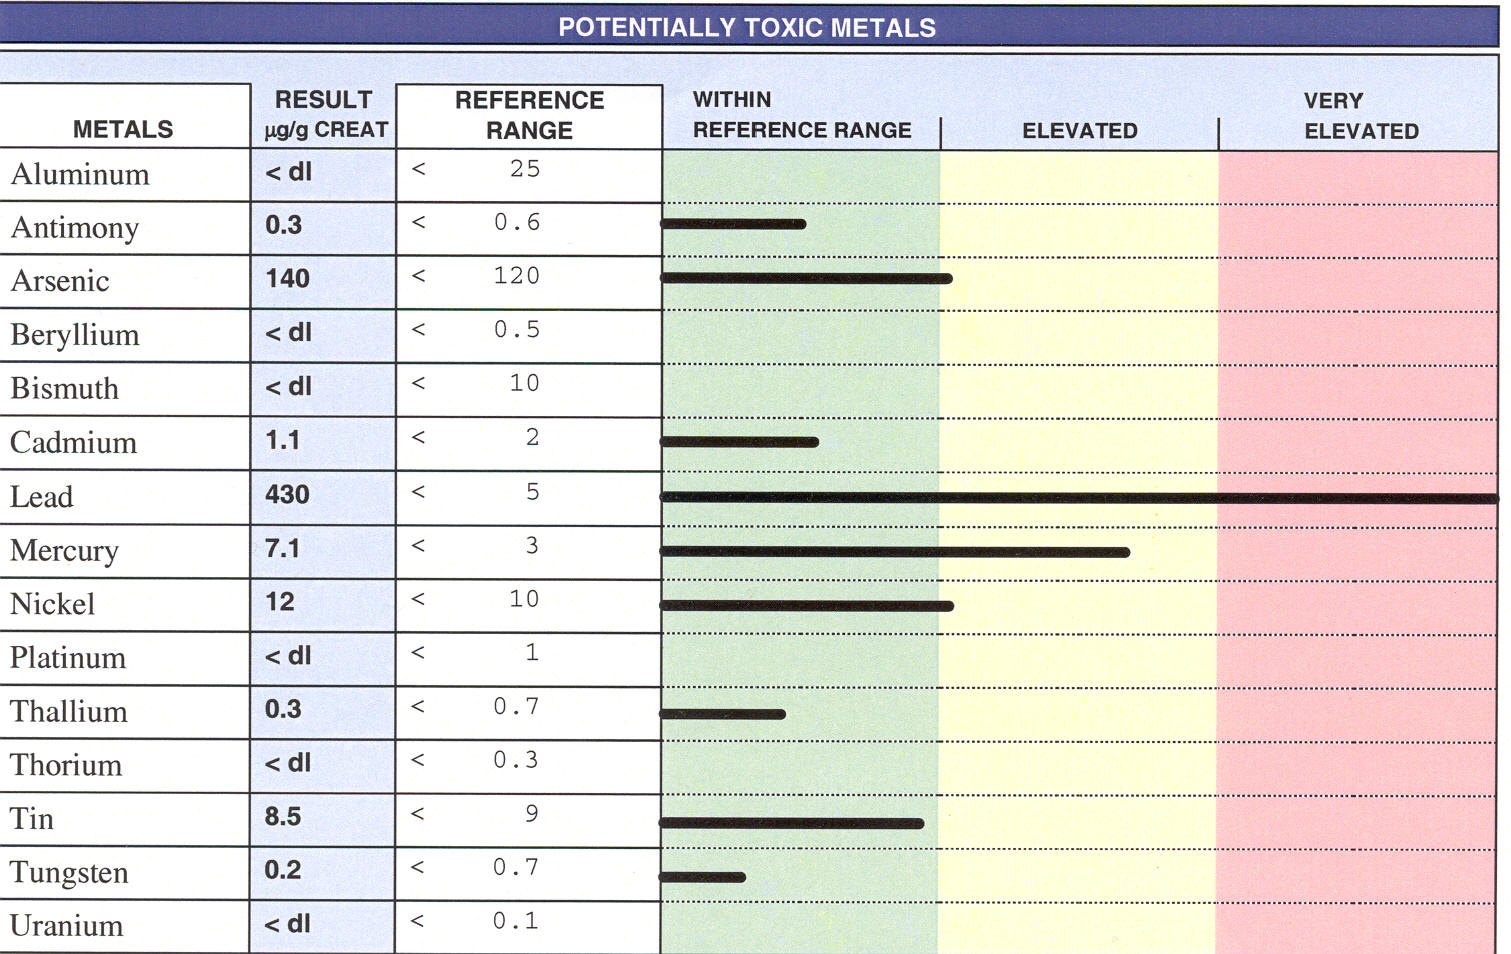 Heavy Metal Testing, Chelation Provoked Samples & Irrelevant